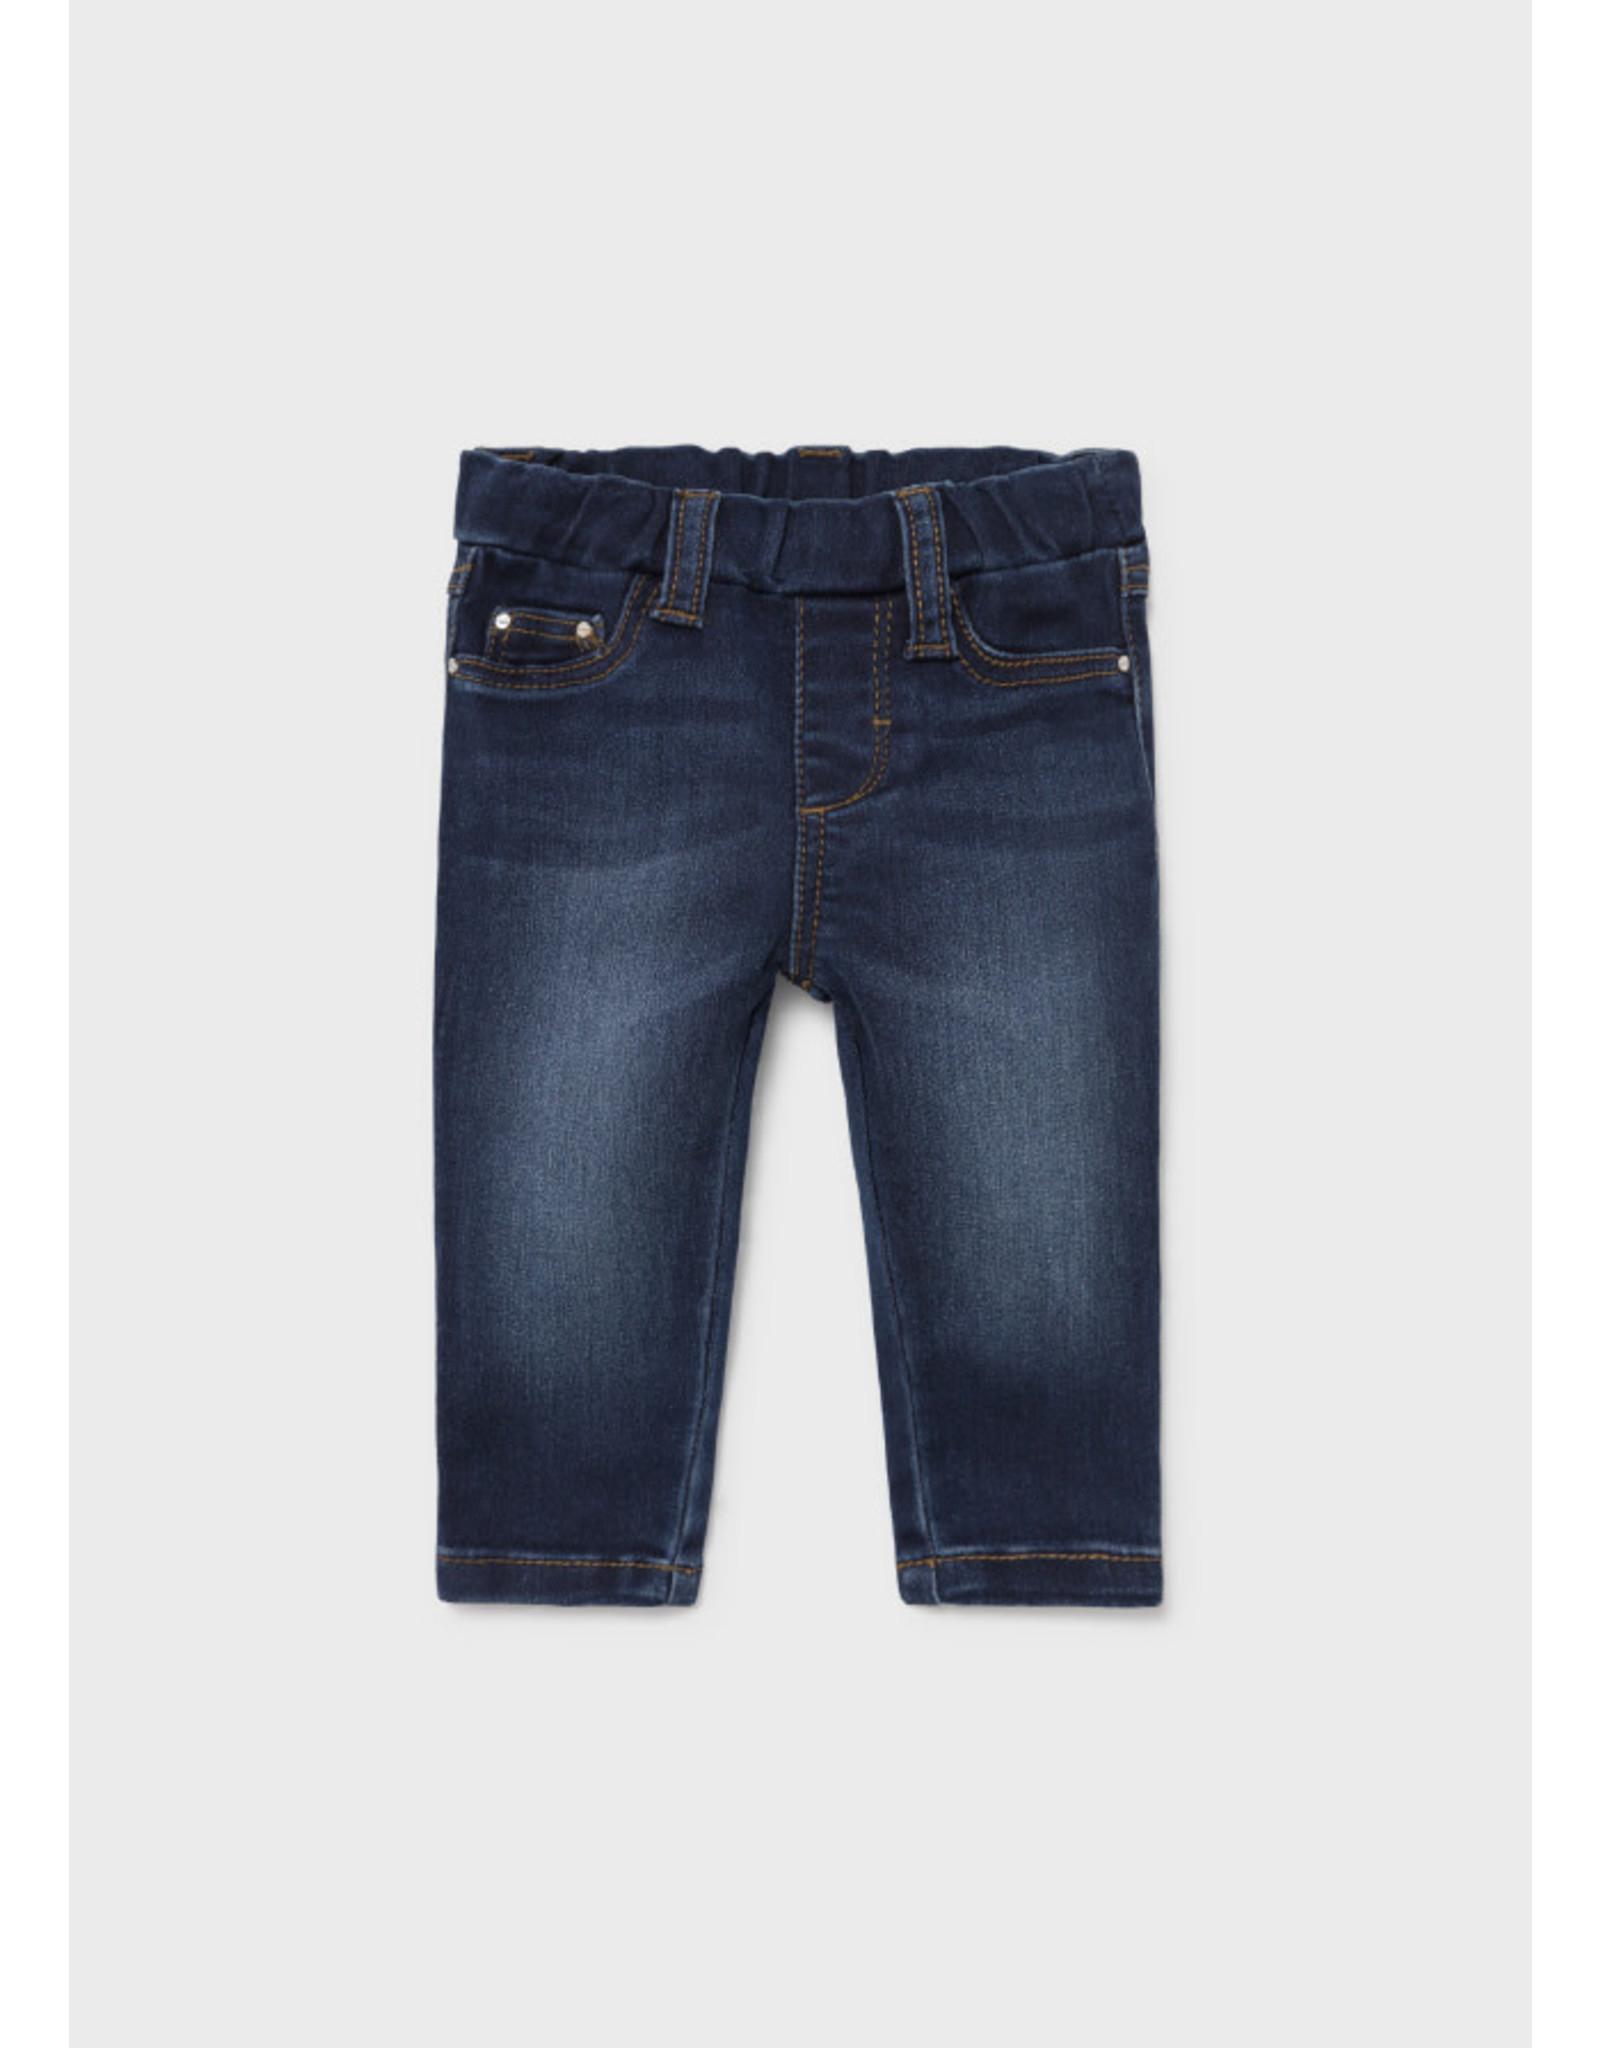 Mayoral Baby Basic Denim Trousers - Dark